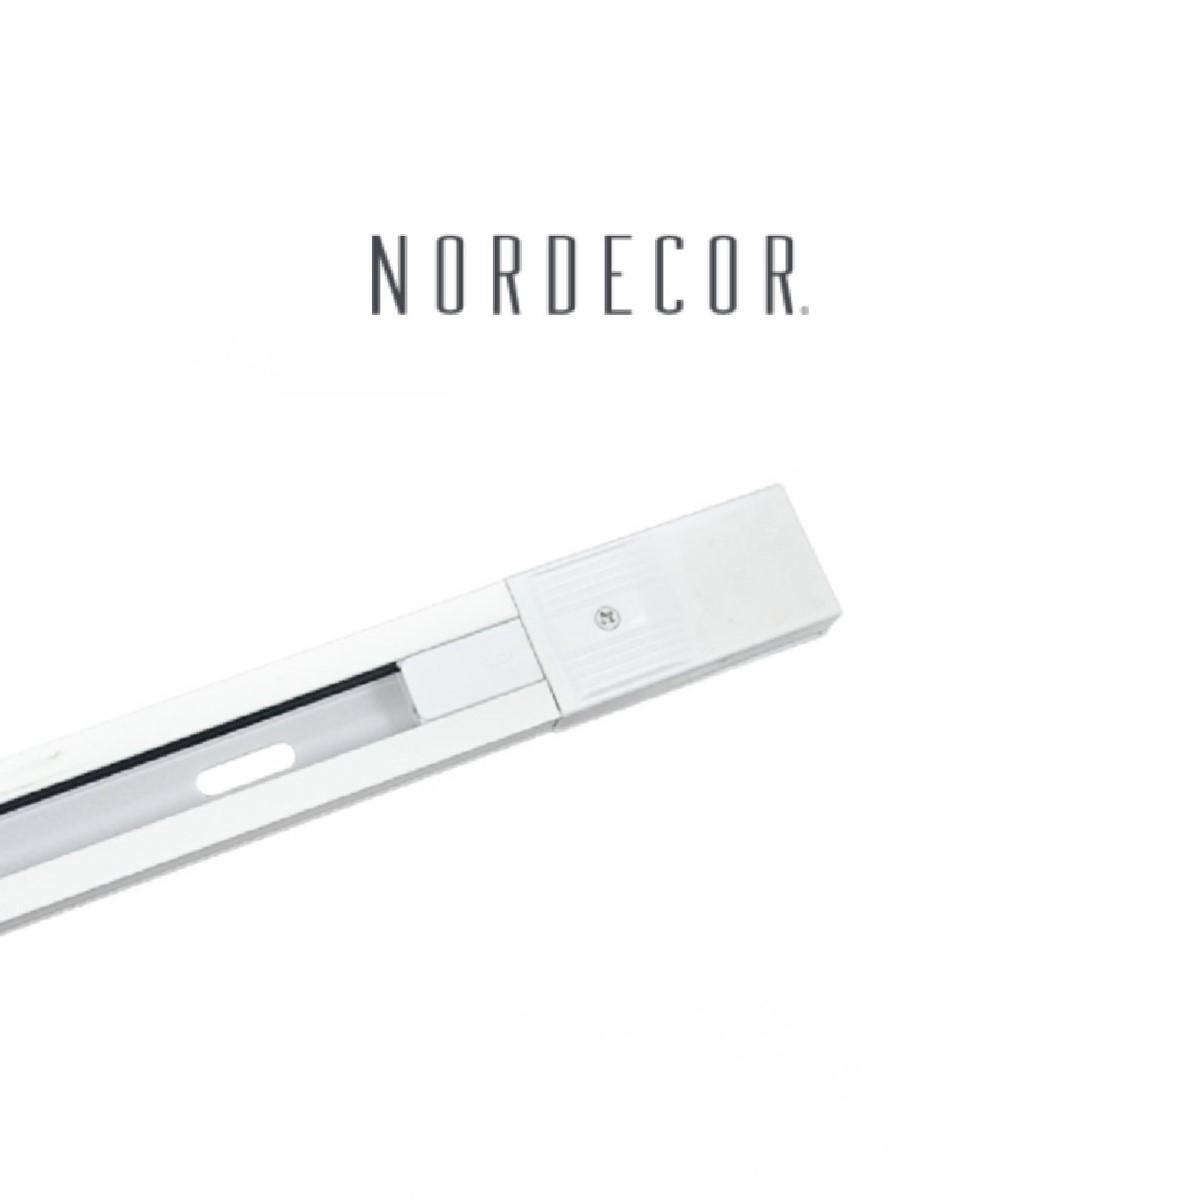 Kit Trilho Eletrificado 2m Branco Nordecor + 4 Spot Redondo MR16 / GU10 Para Sala Quarto Cozinha Quadro